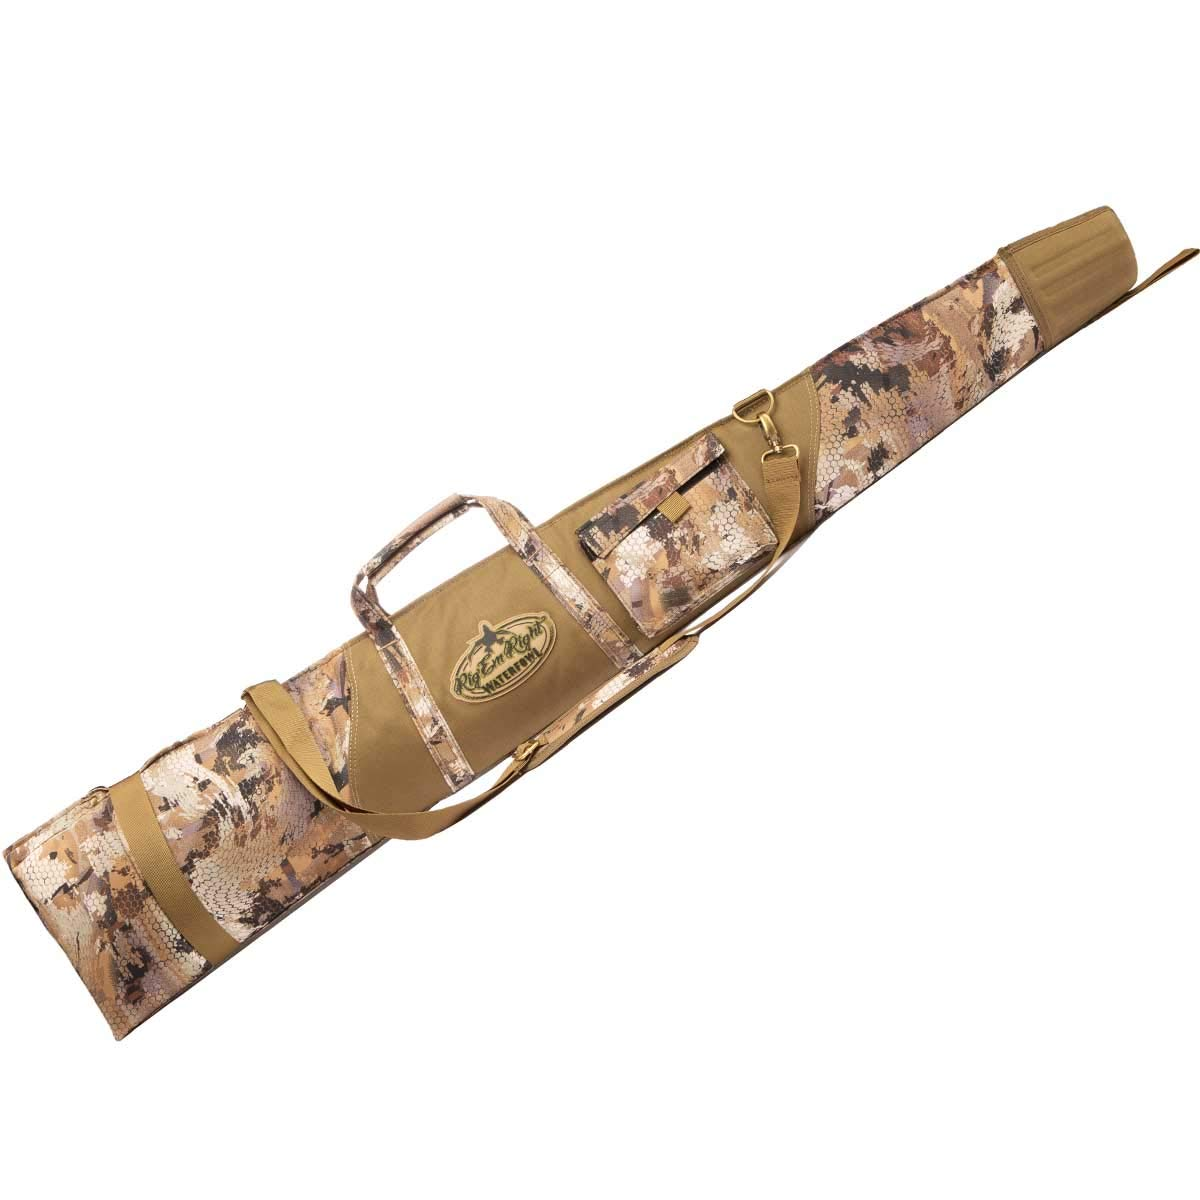 Rig'em Right Waterfowl Full Choke Floating Gun Case - Optifade Marsh Camo by Rig Em Right